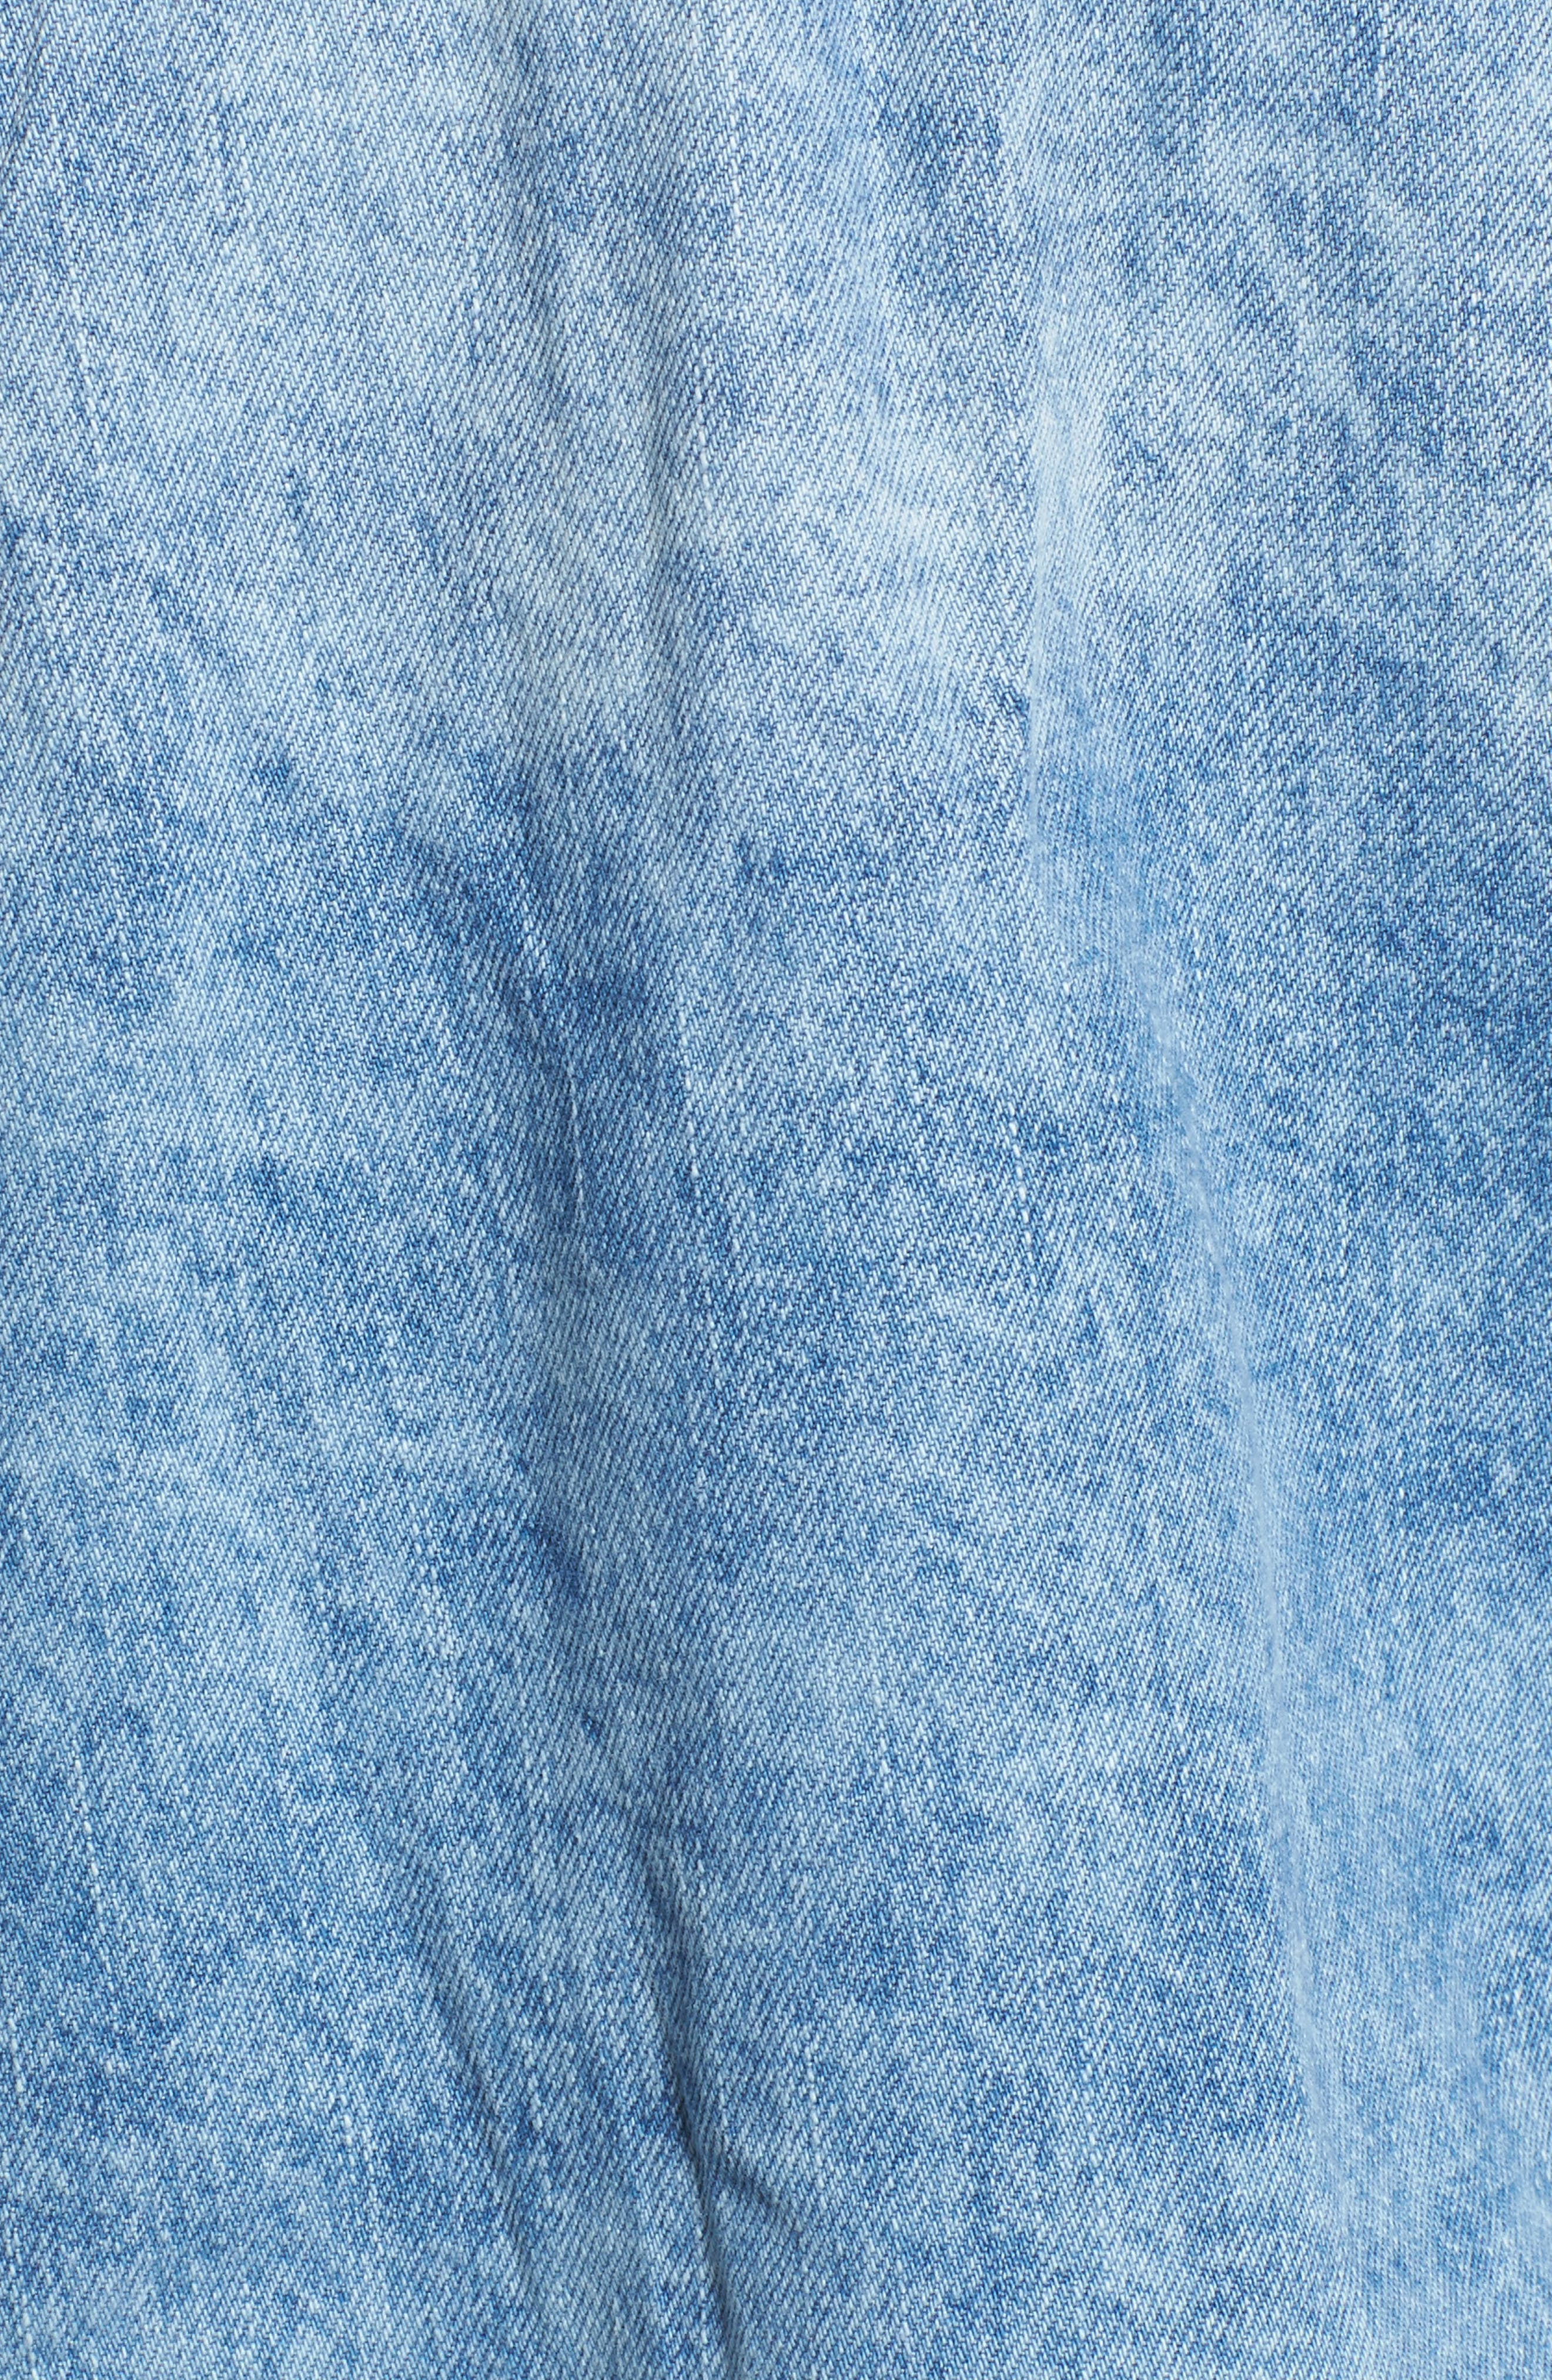 Star & Stud Denim Jacket,                             Alternate thumbnail 5, color,                             Blue